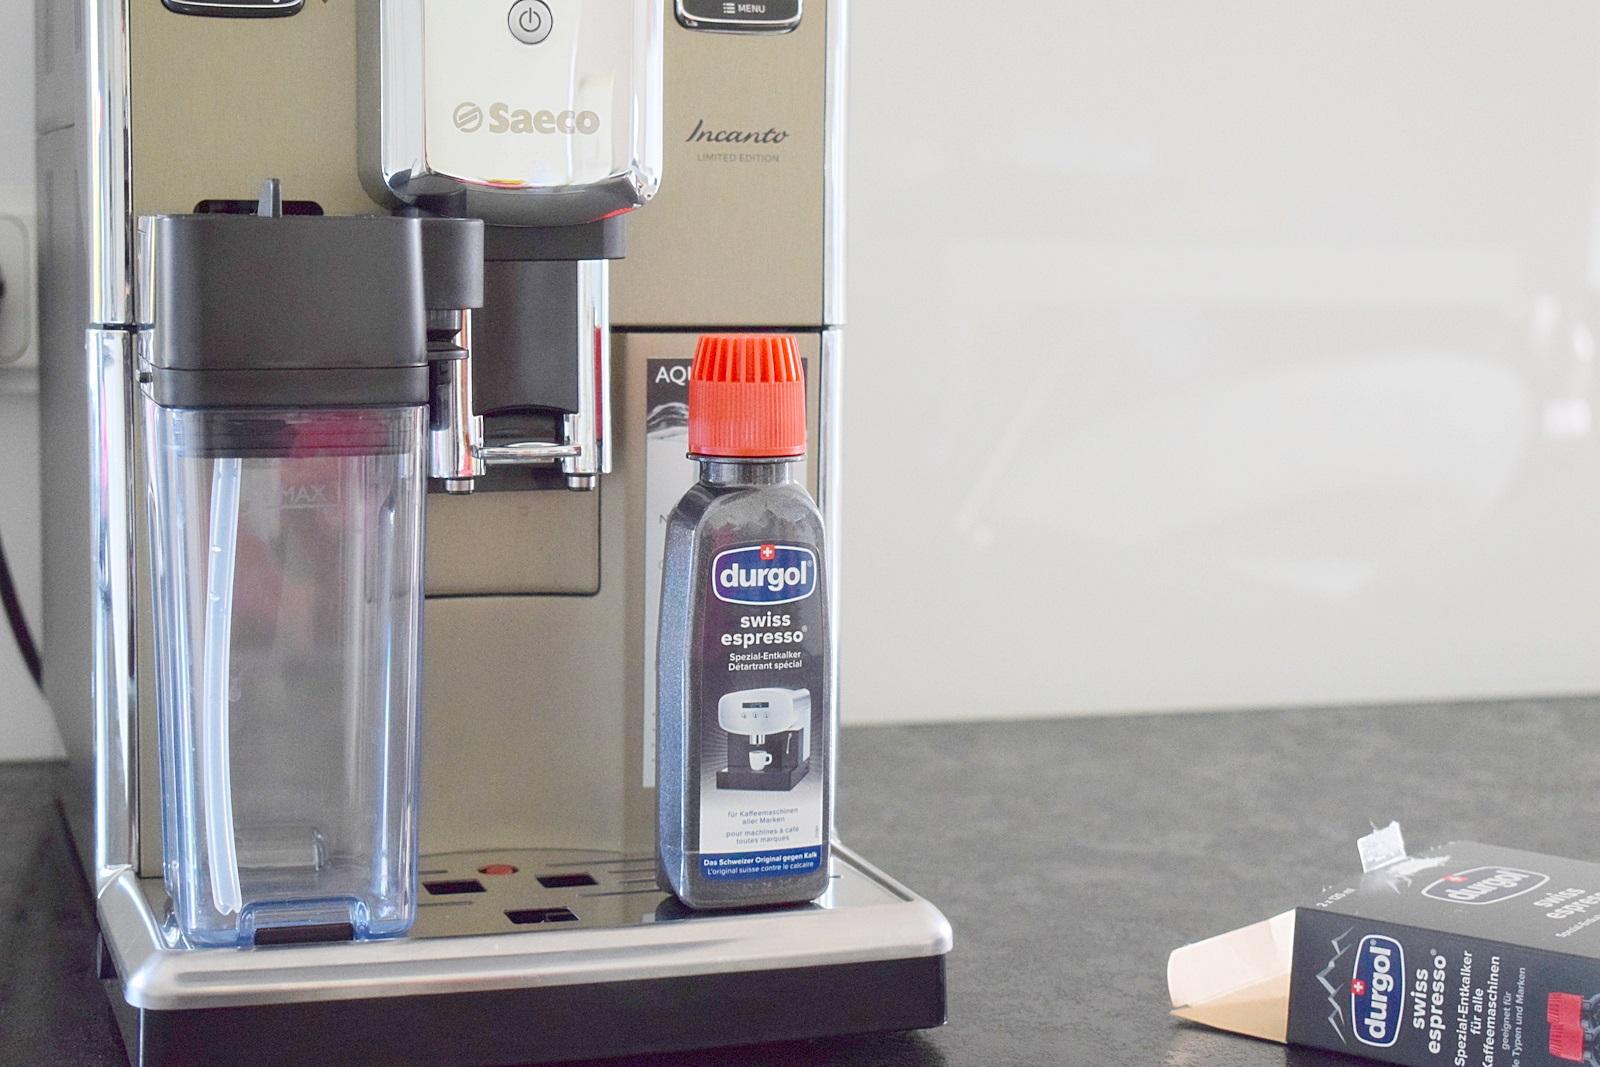 kaffeemaschine richtig entkalken  unalife ~ Kaffeemaschine Cafissimo Entkalken